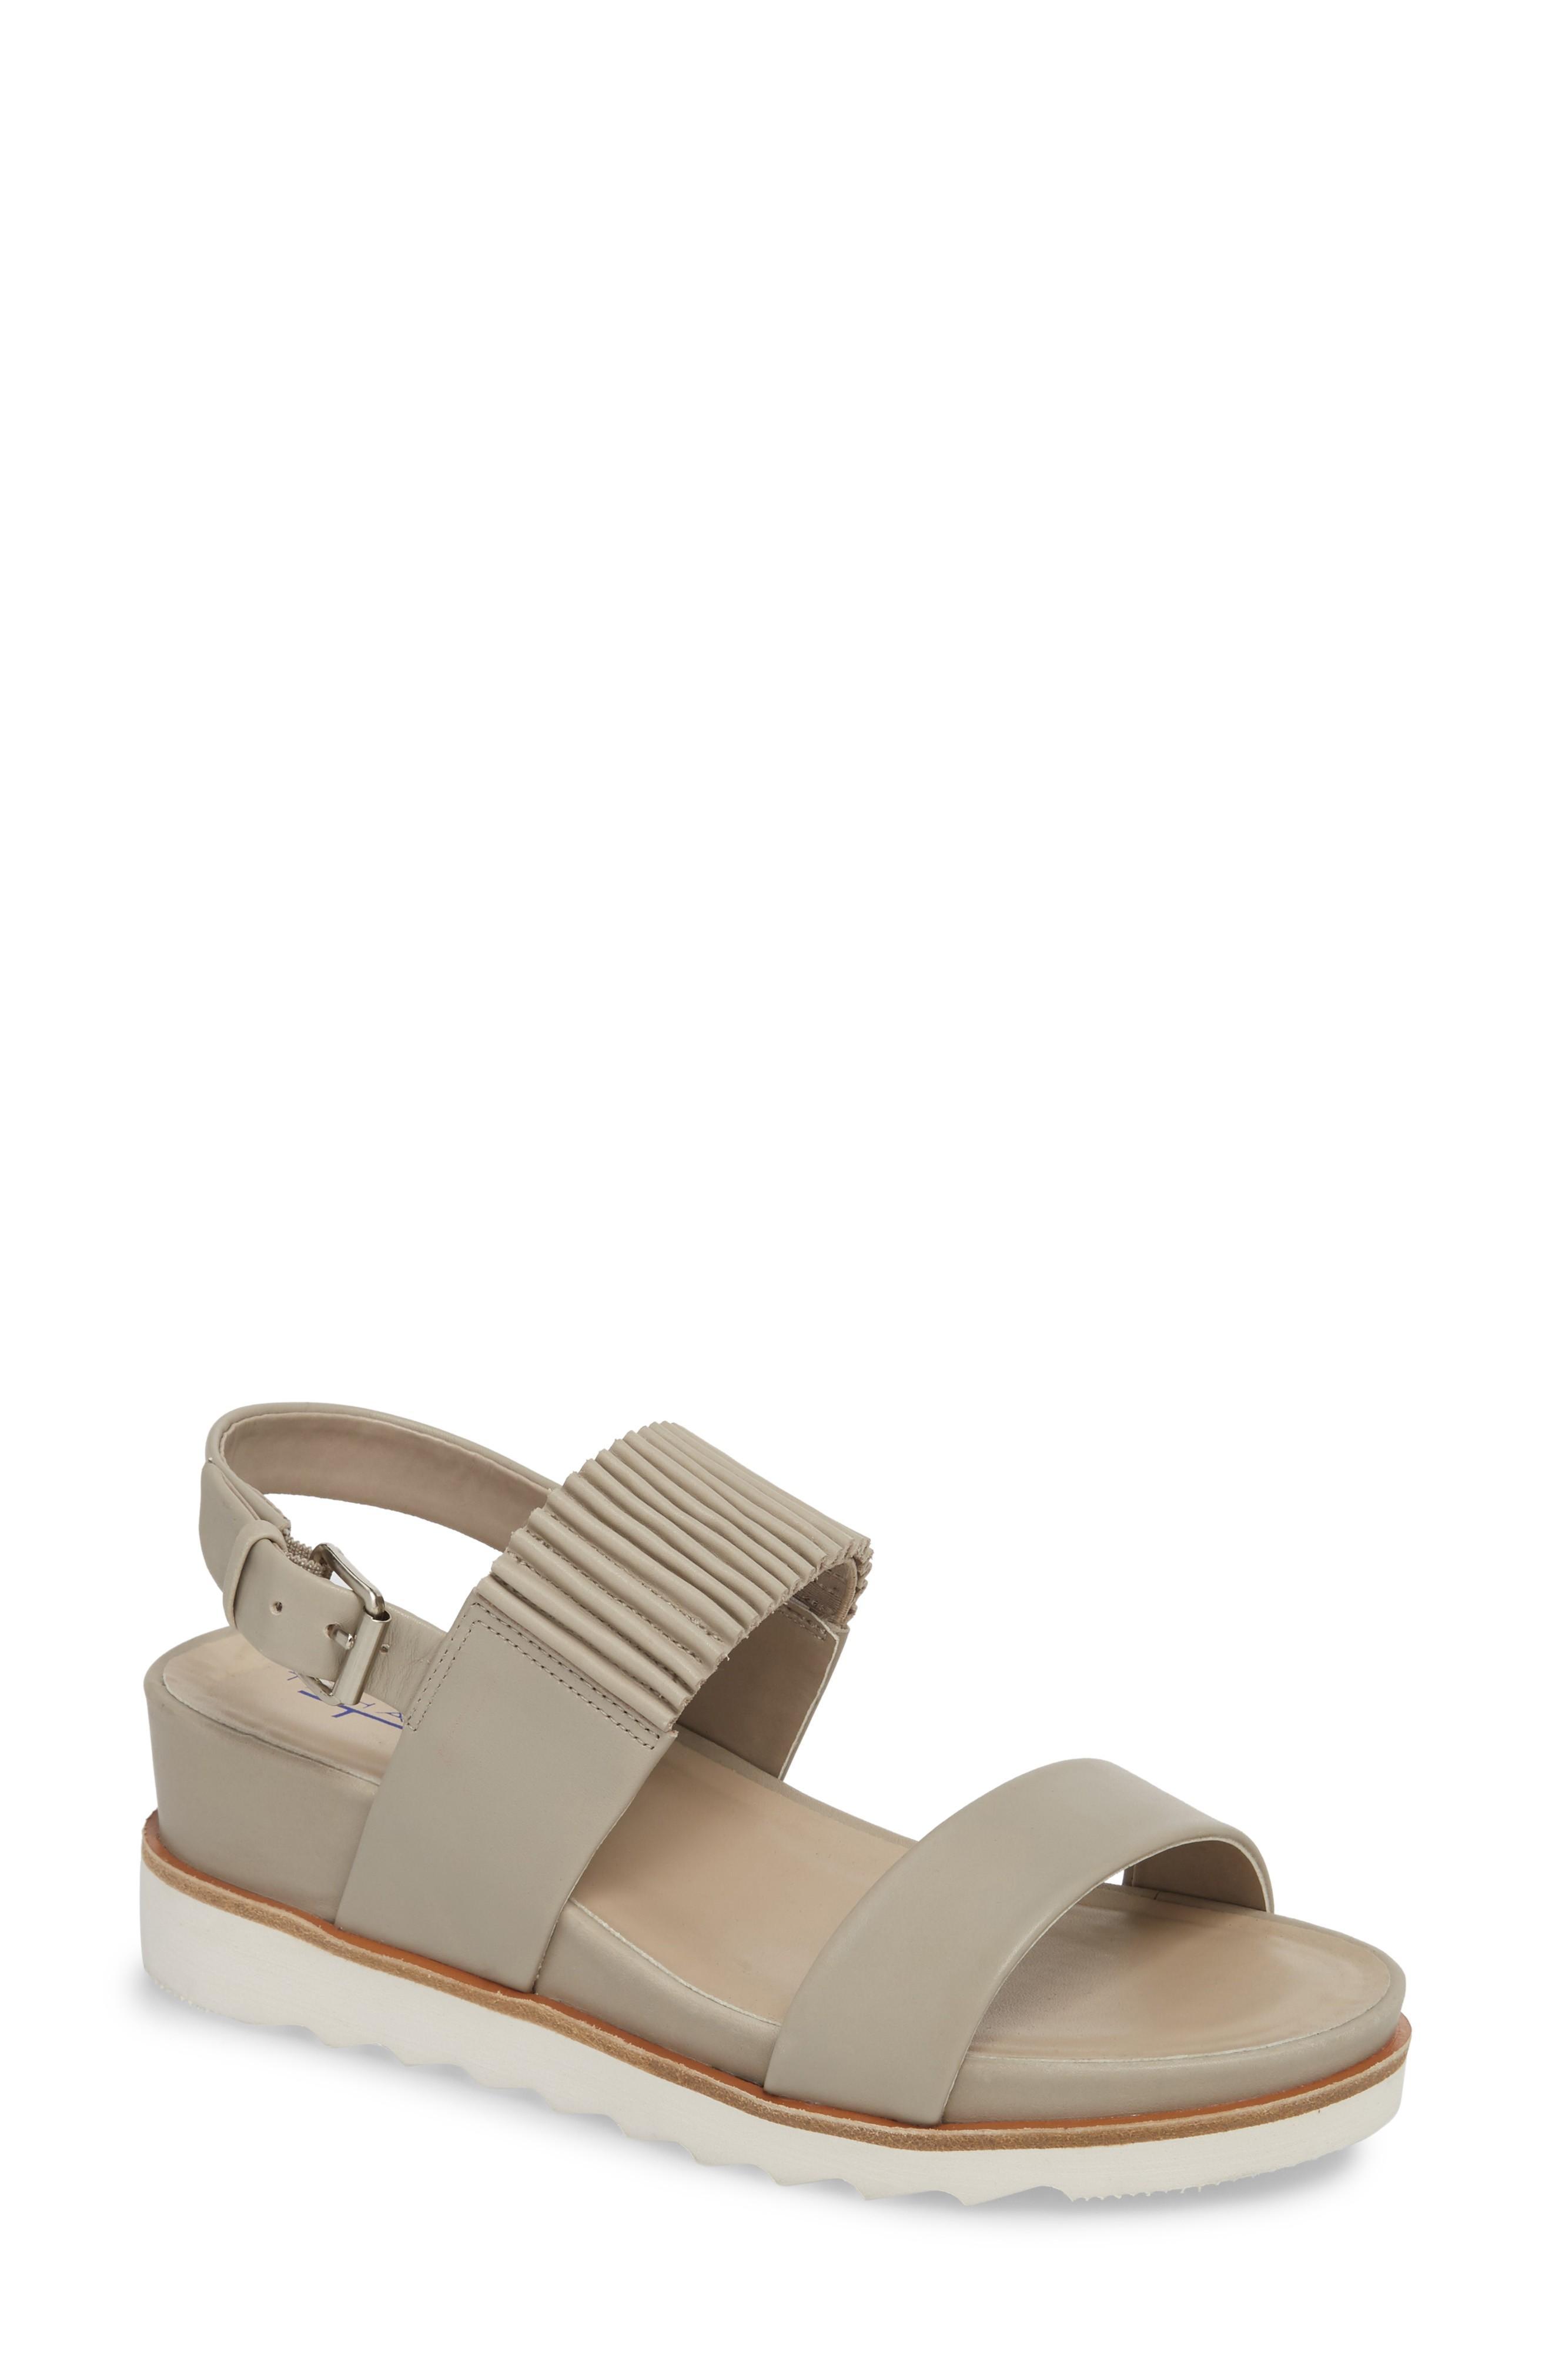 T Tahari Grace Wedge Sandal In Dove Leather